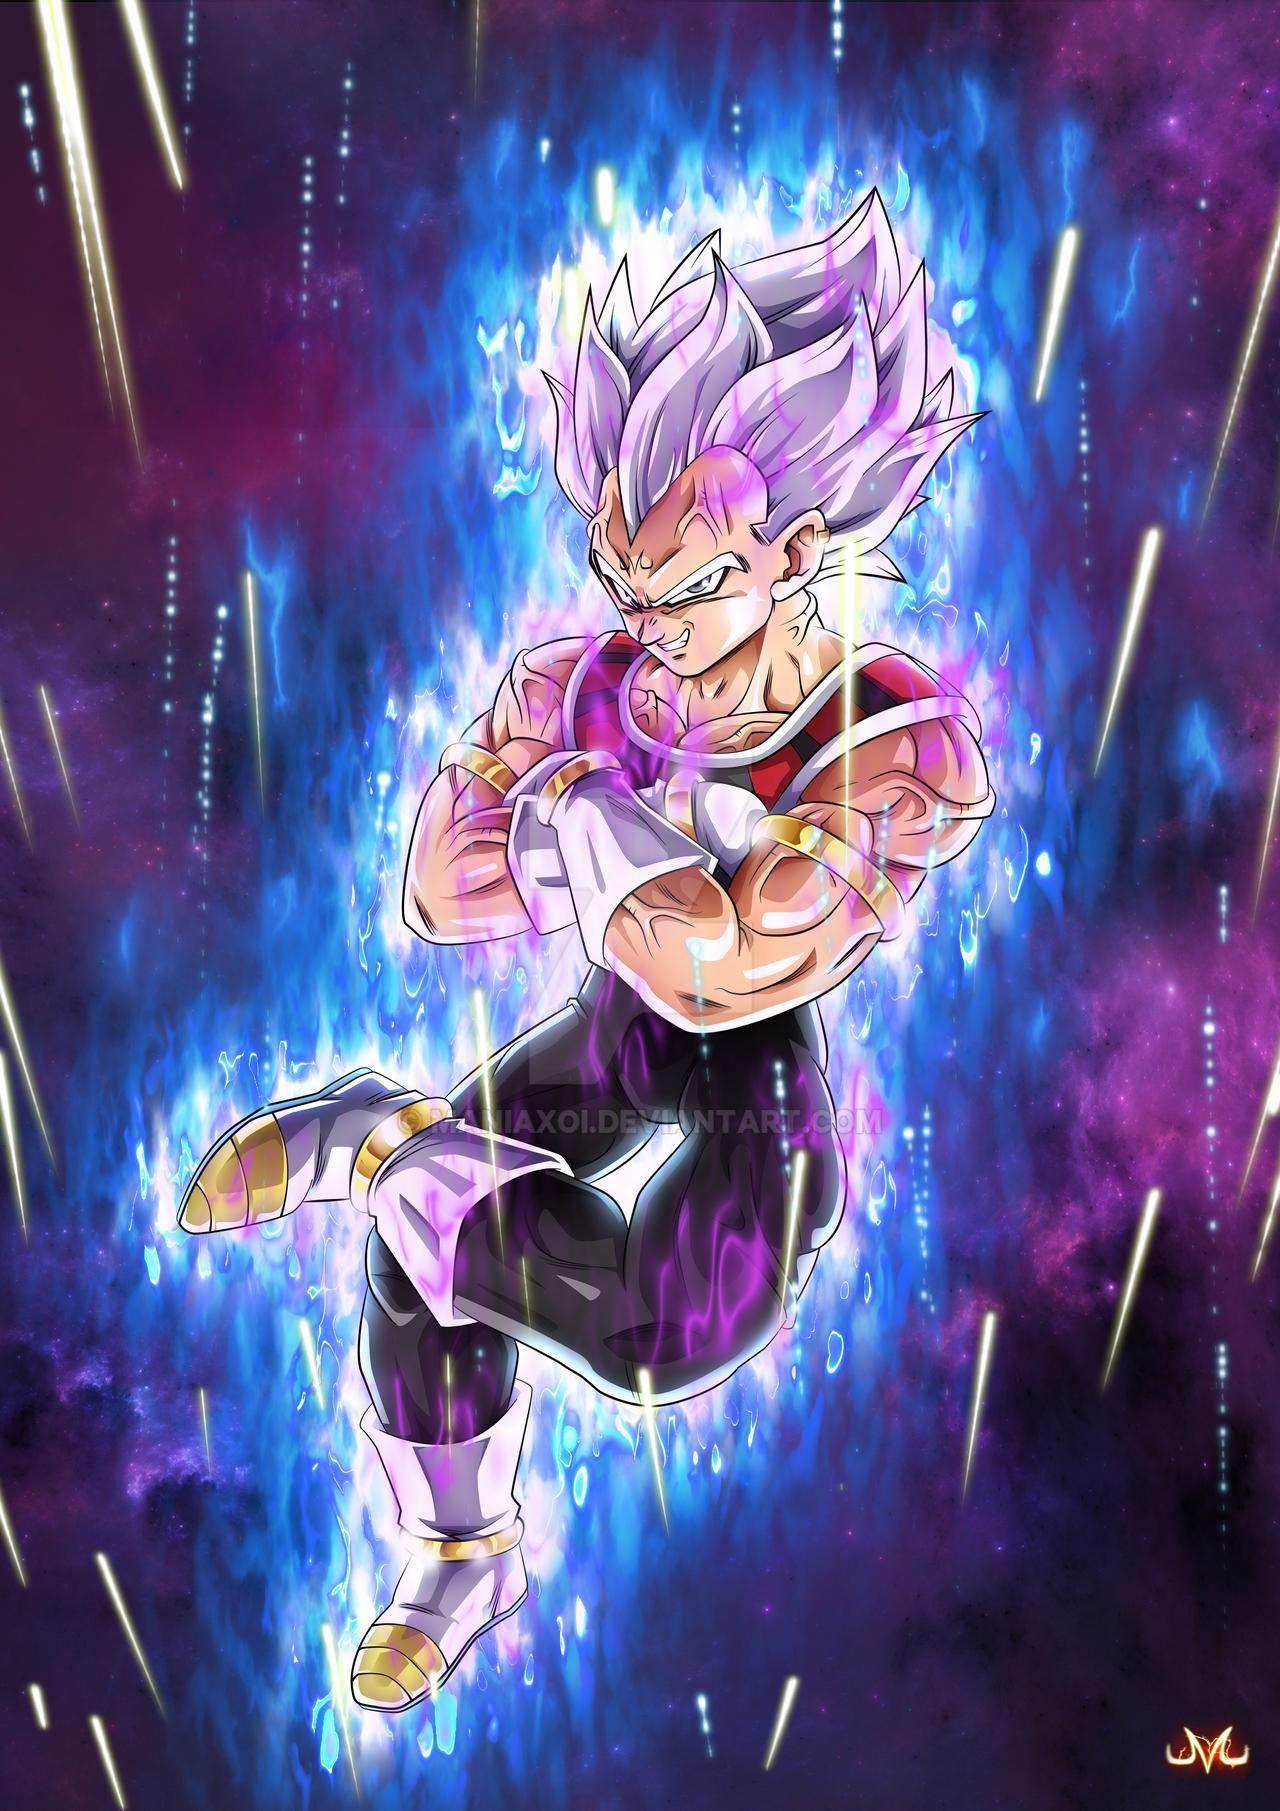 Majin Vegeta Ultra Instinct Mastered By Maniaxoi On Deviantart Dragon Ball Super Artwork Anime Dragon Ball Super Dragon Ball Super Art